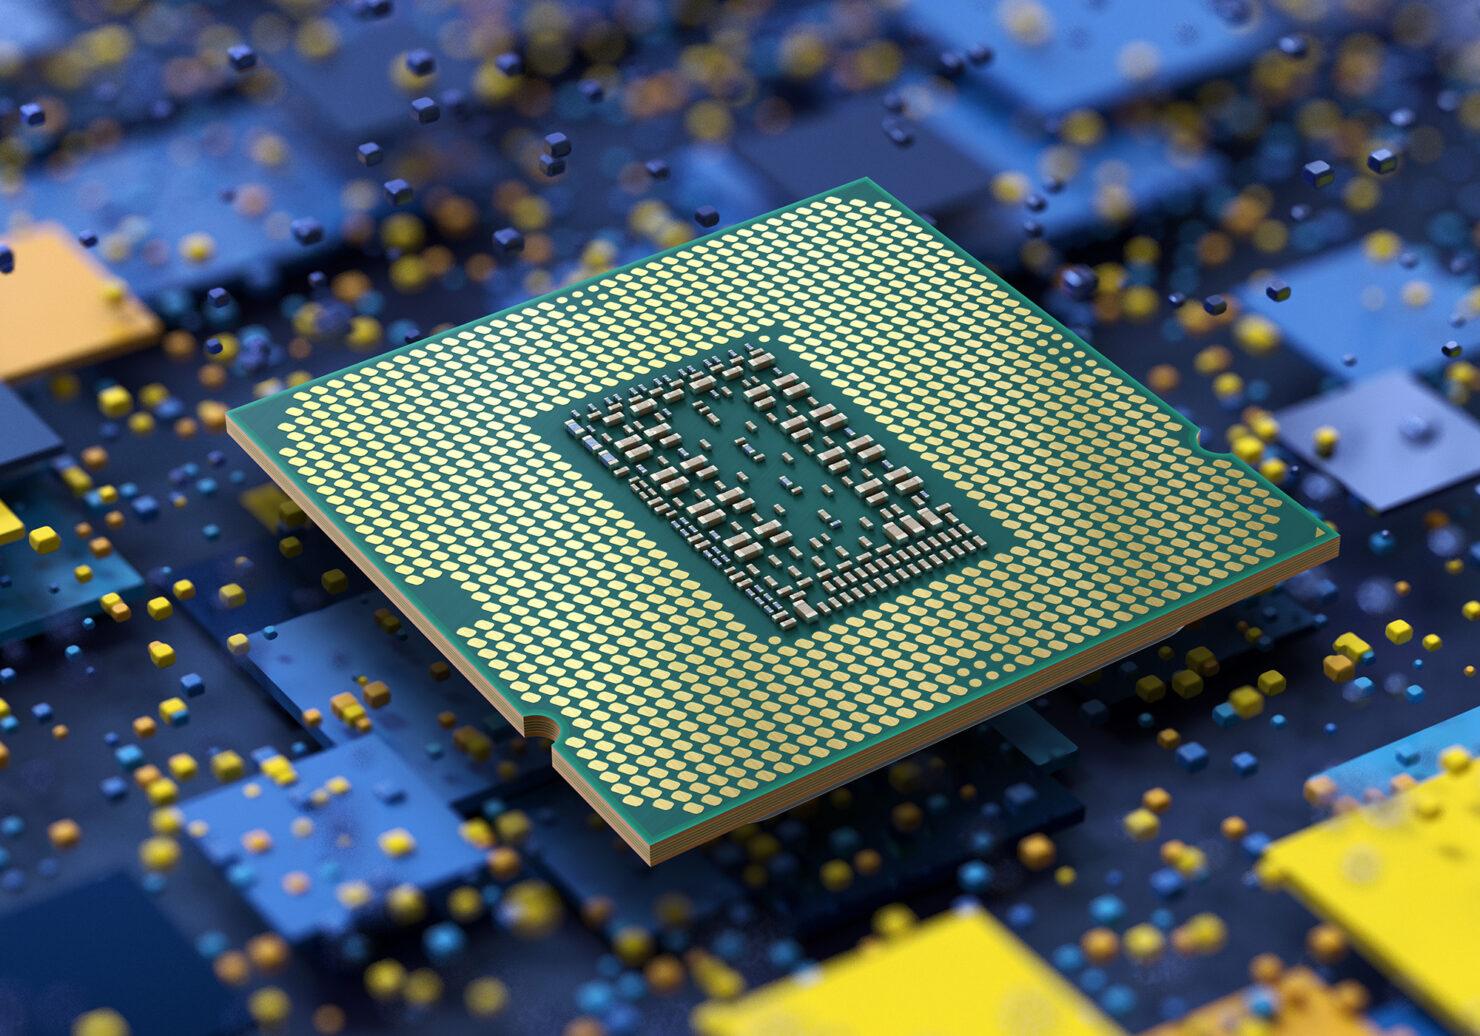 intel-10nm-alder-lake-s-desktop-engineering-sample-cpu-benchmarked-with-ddr5-4800-memory-&-2.2-ghz-clock-speeds